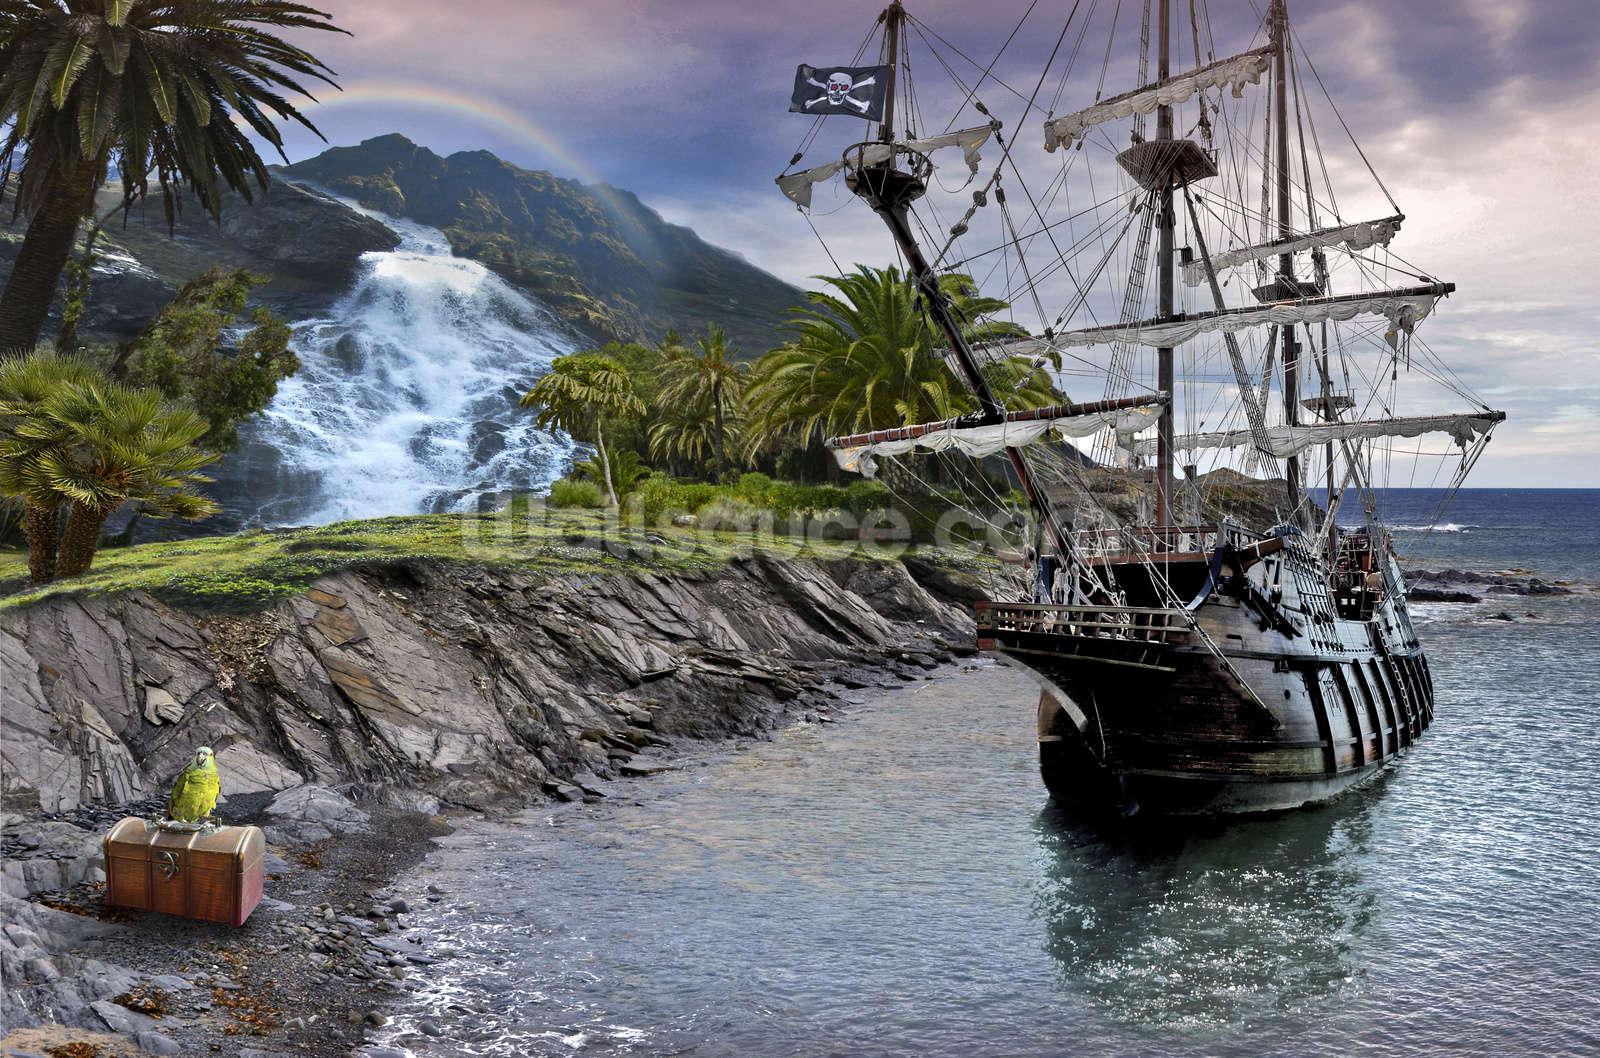 Awesome Pirate Ship At Anchor Wall Mural Photo Wallpaper Part 5